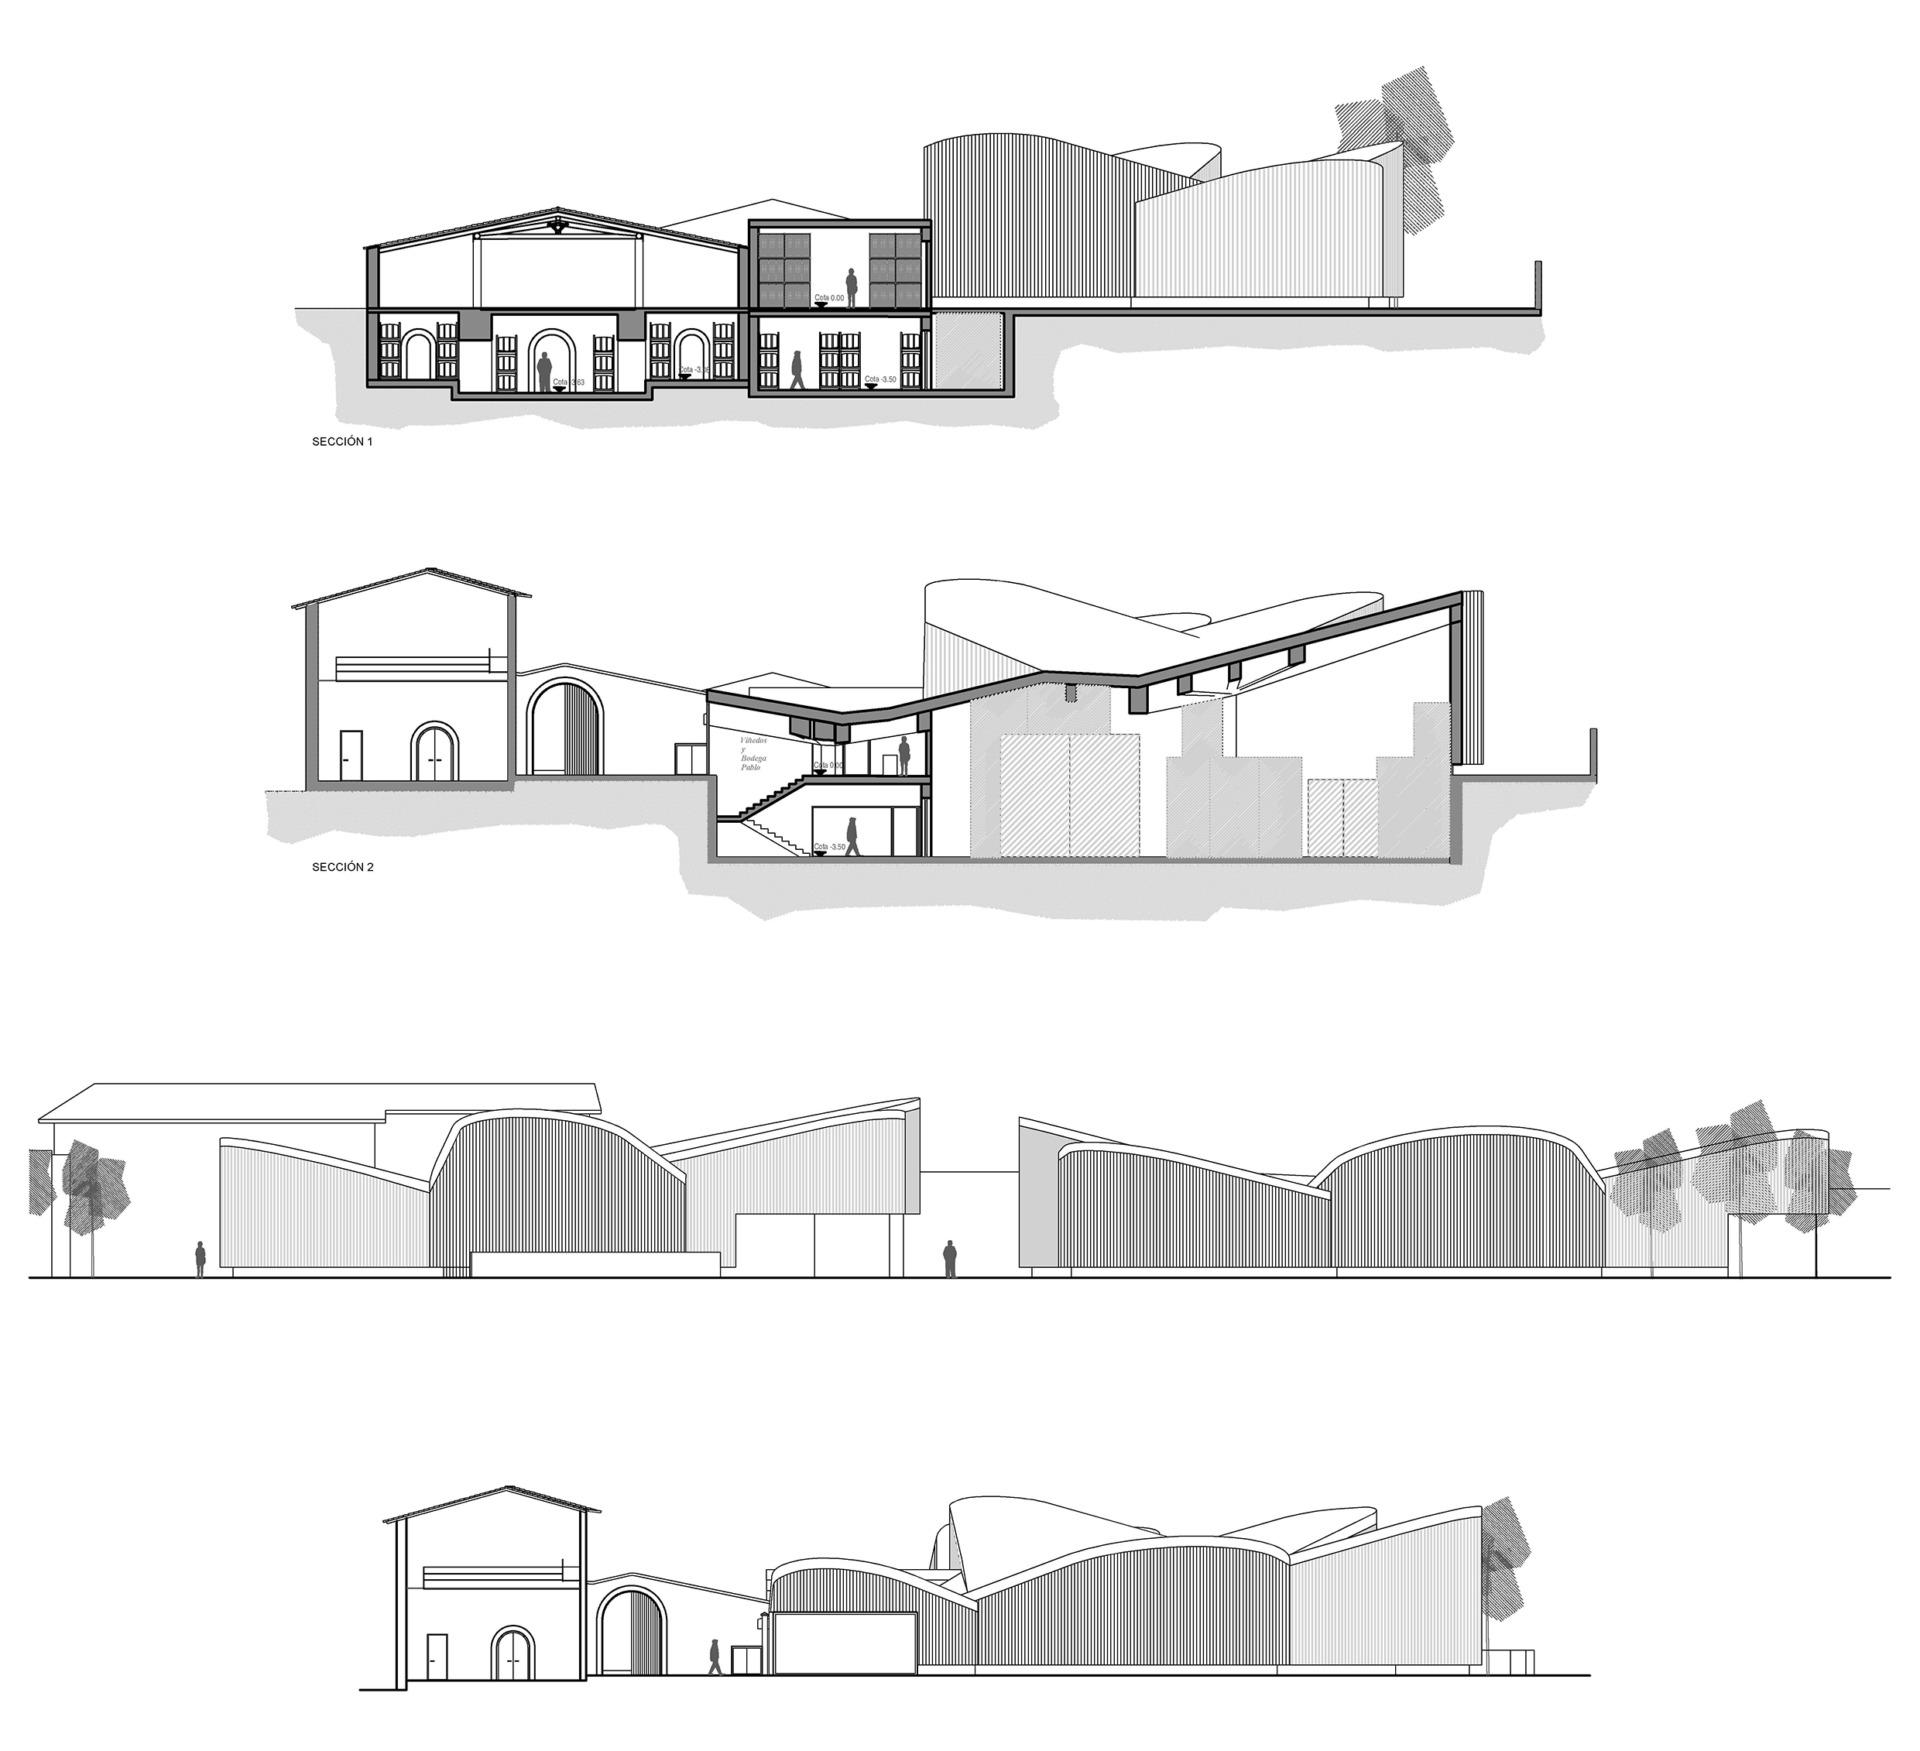 Sala Ferusic Architects Bella Umbrella Carles Sala Relja Ferusic